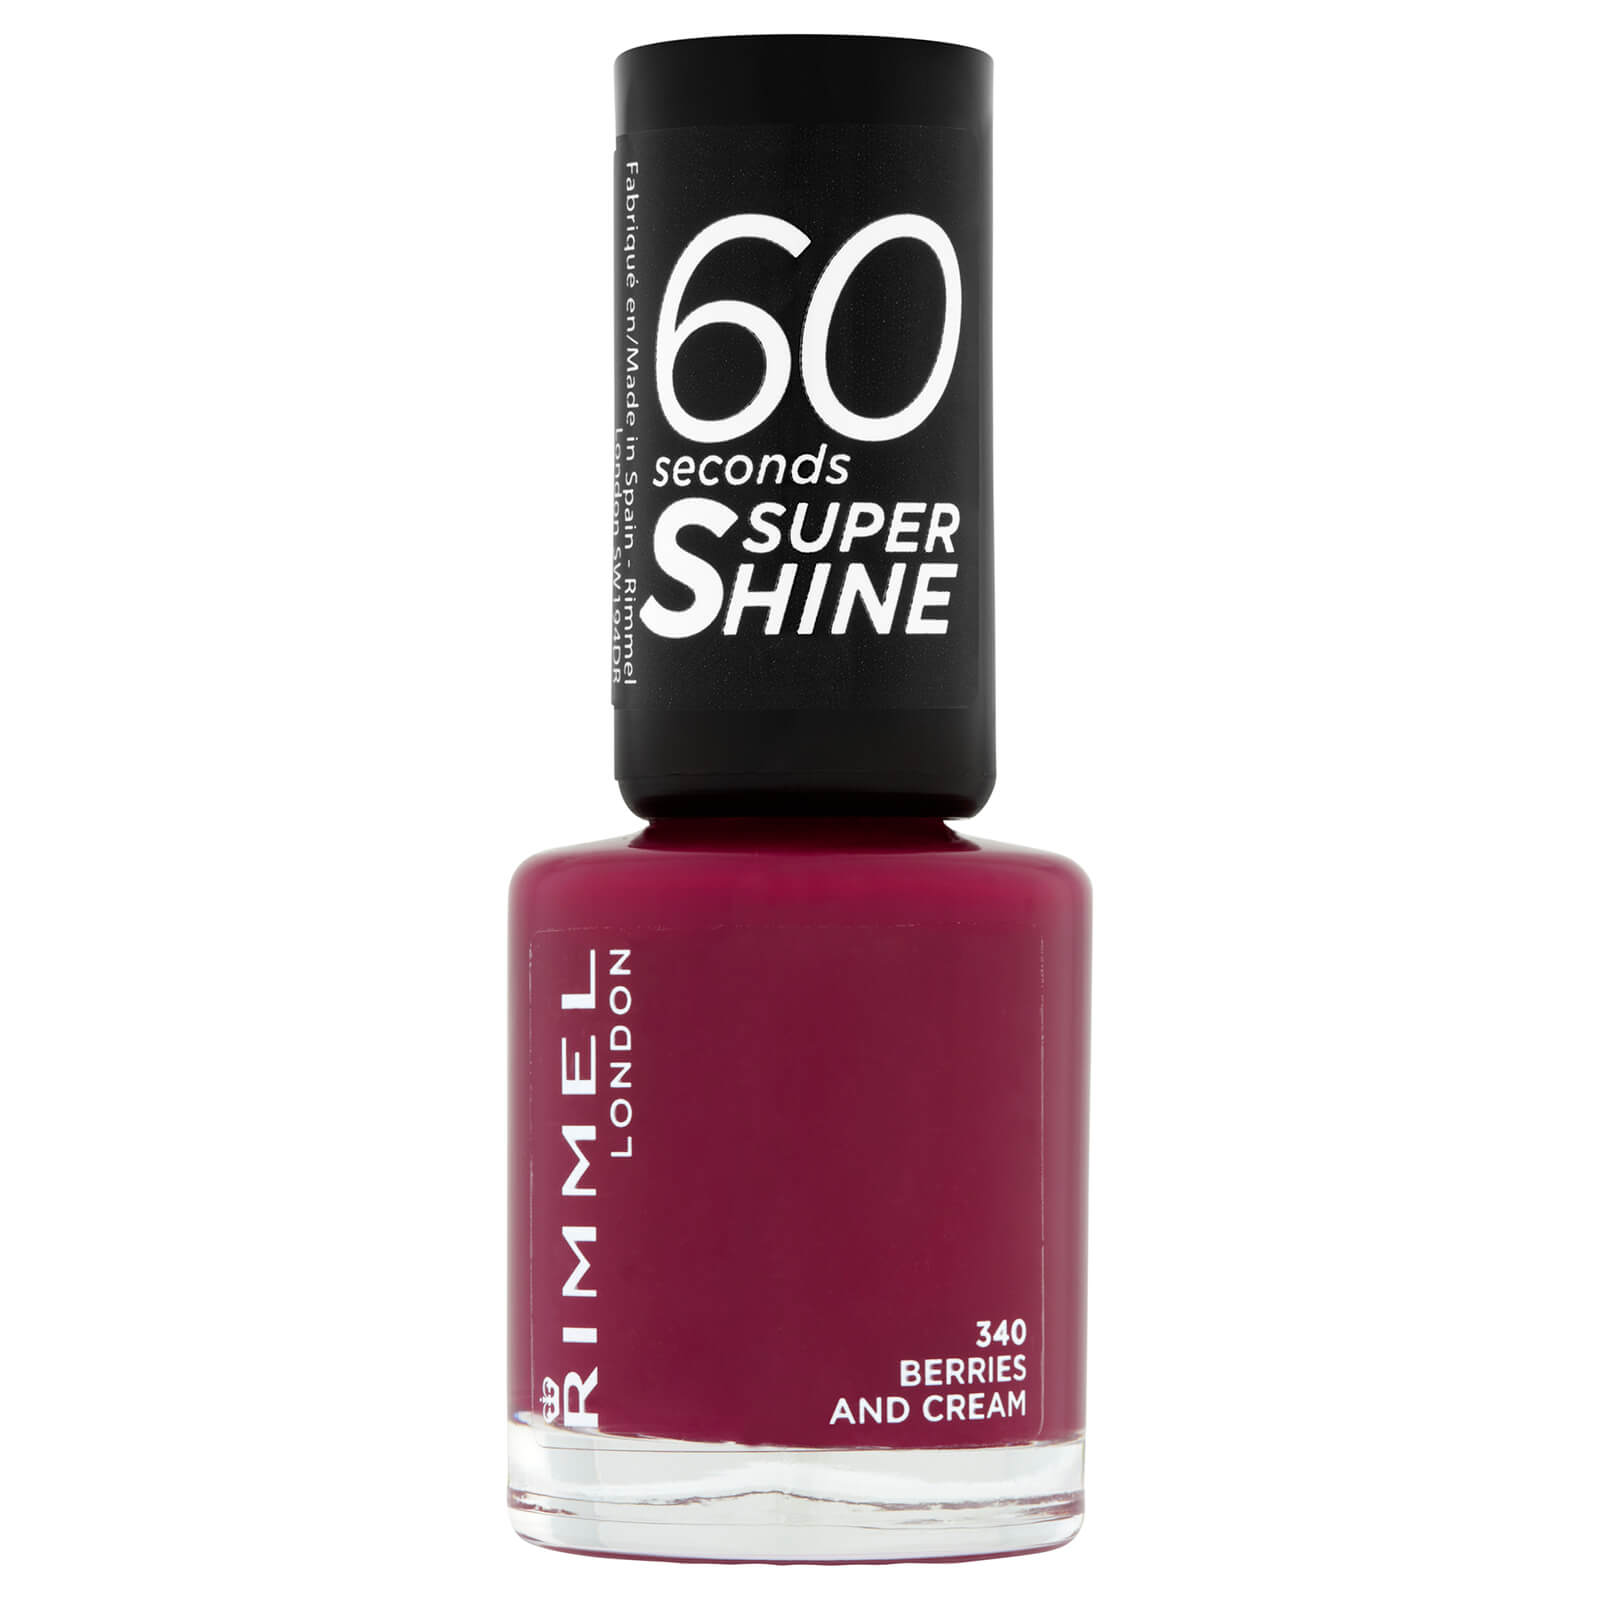 Rimmel 60 Seconds Super Shine Nail Polish 8ml (Various Shades) - Berries and Cream